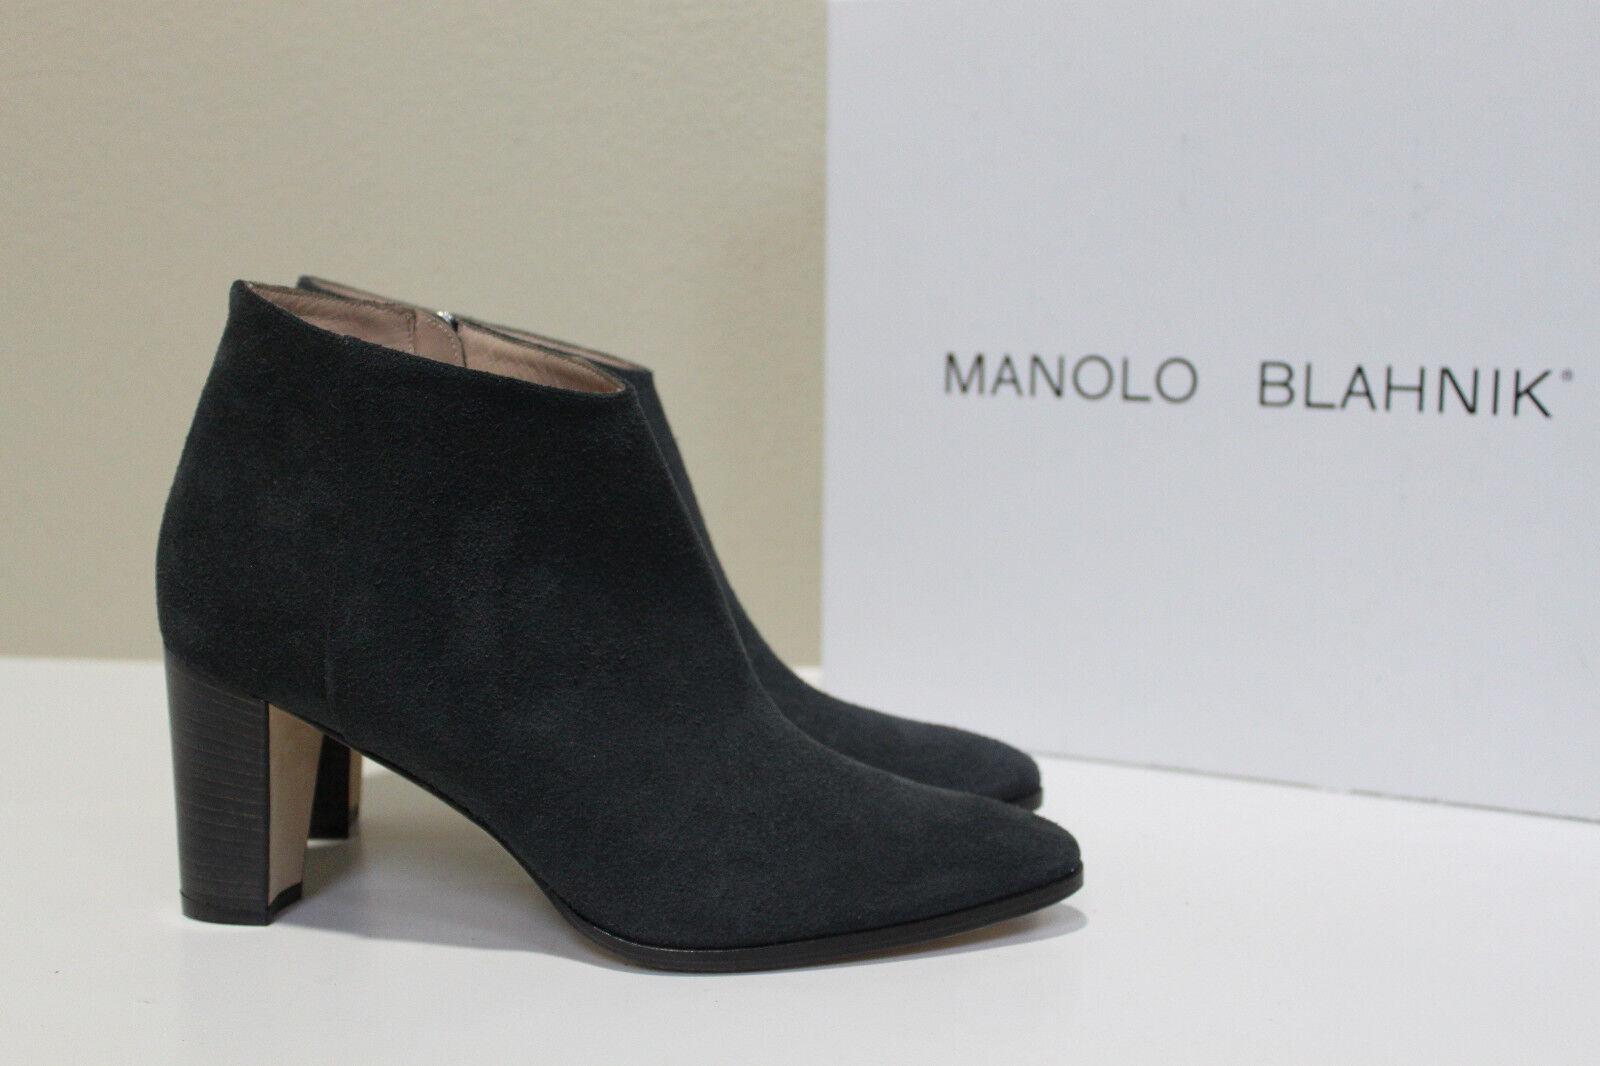 New sz 10 / 40 Manolo Blahnik Brusta Gray Suede Pointed Toe Ankle Bootie Shoe